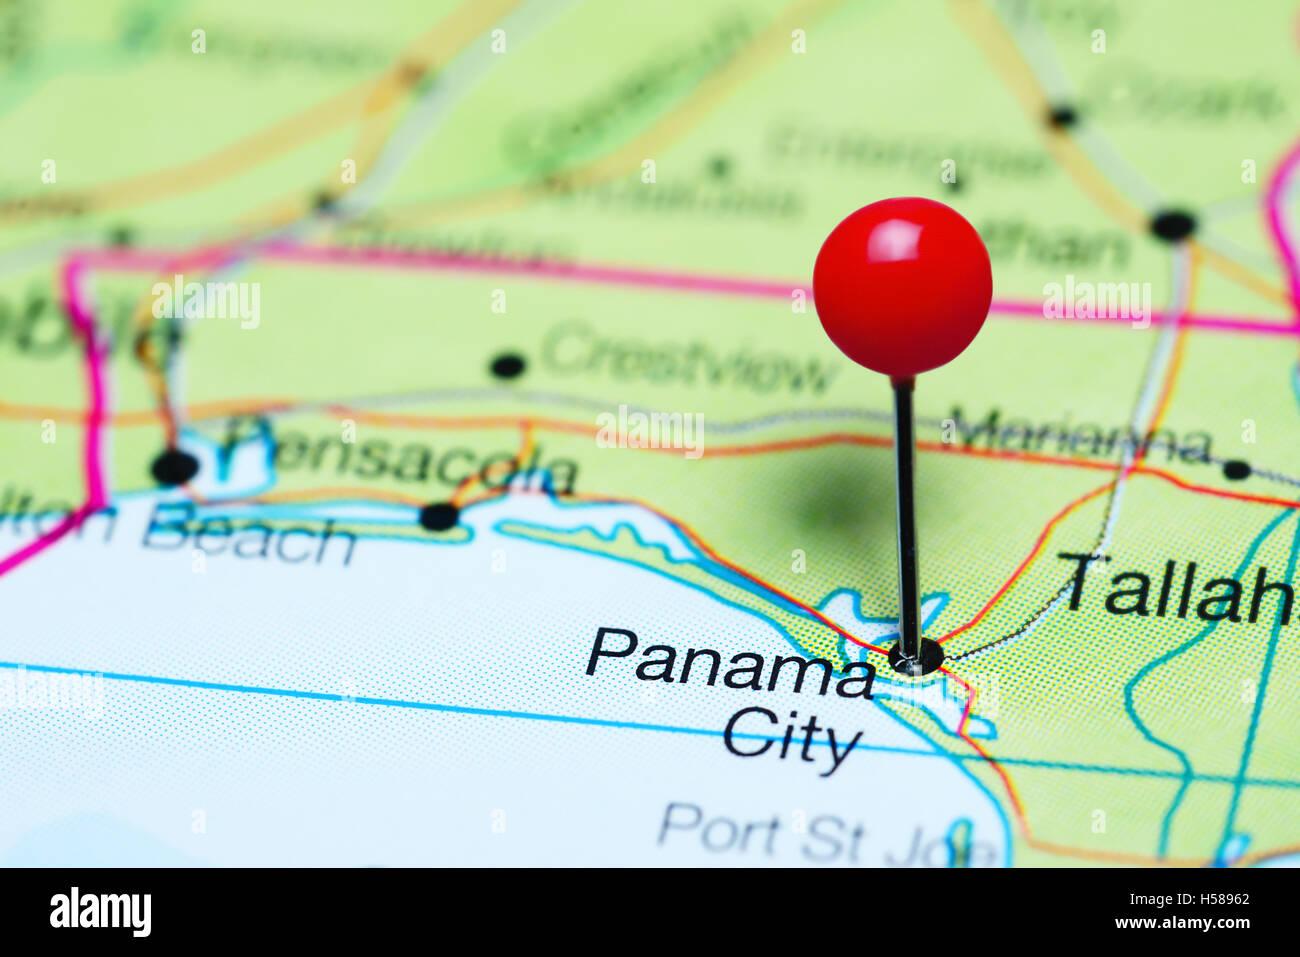 Panama City Map Of Florida.Panama City Pinned On A Map Of Florida Usa Stock Photo 123728698